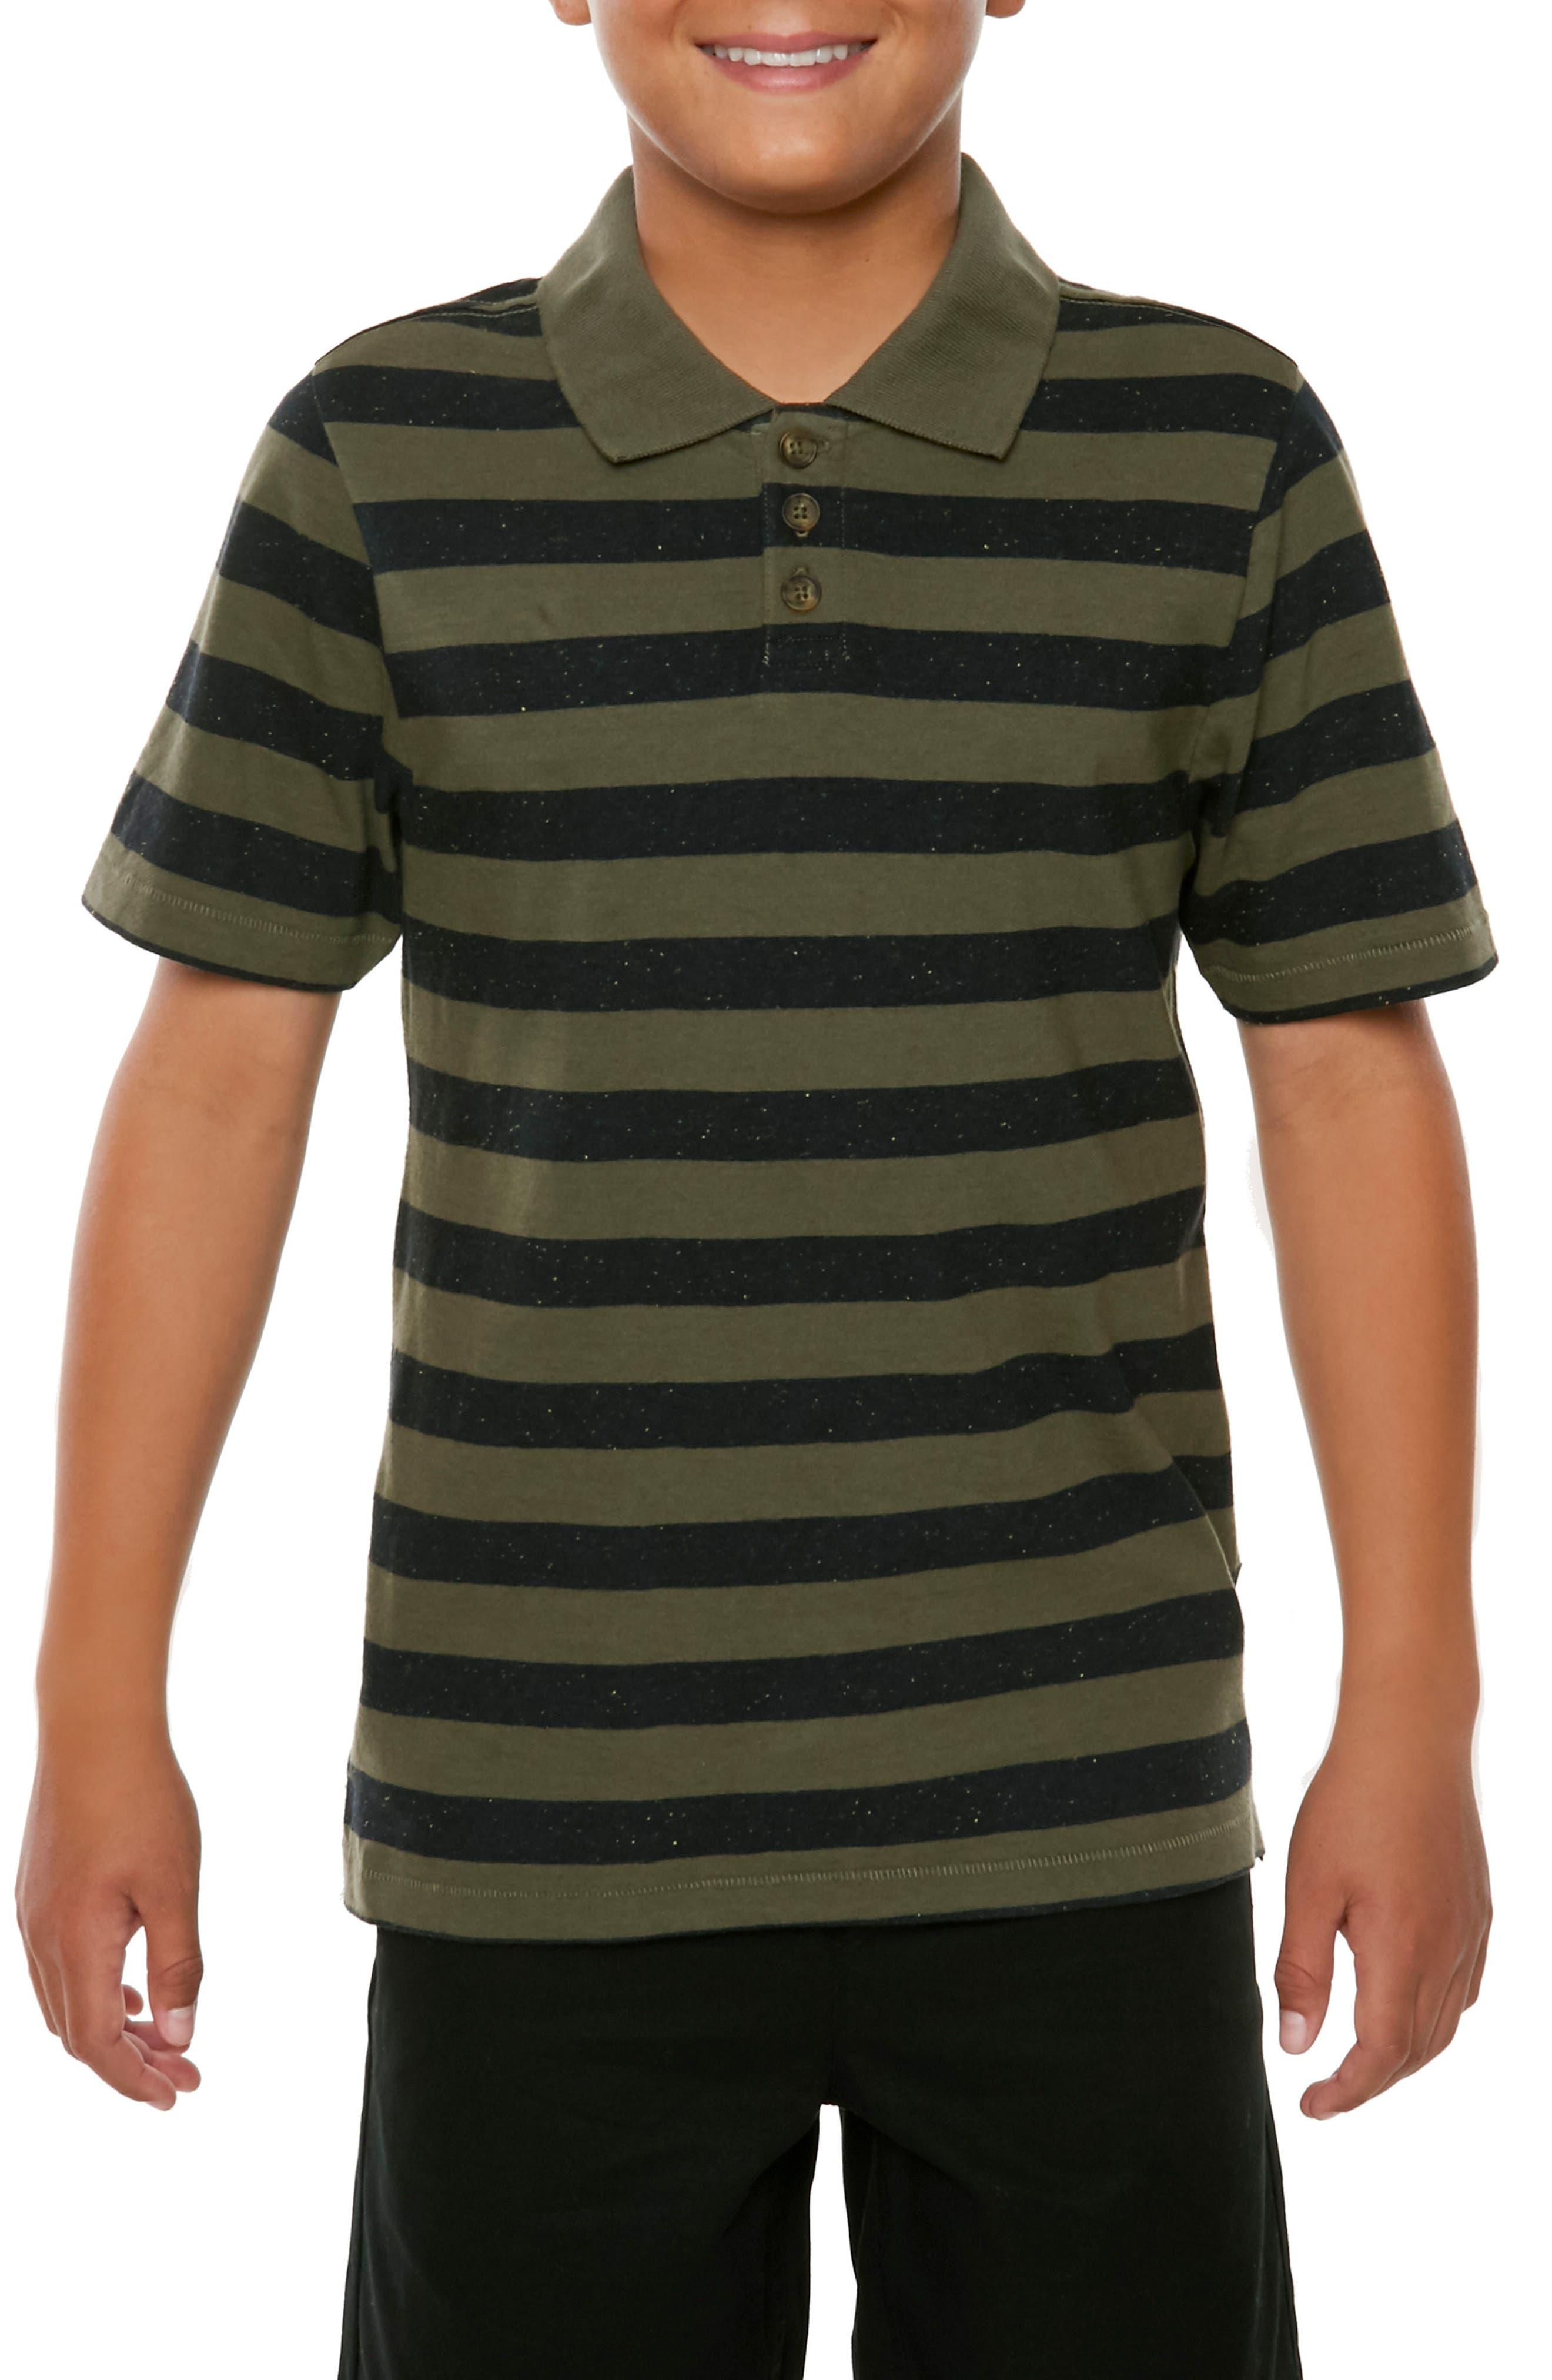 Scoundrel Striped Polo,                         Main,                         color,